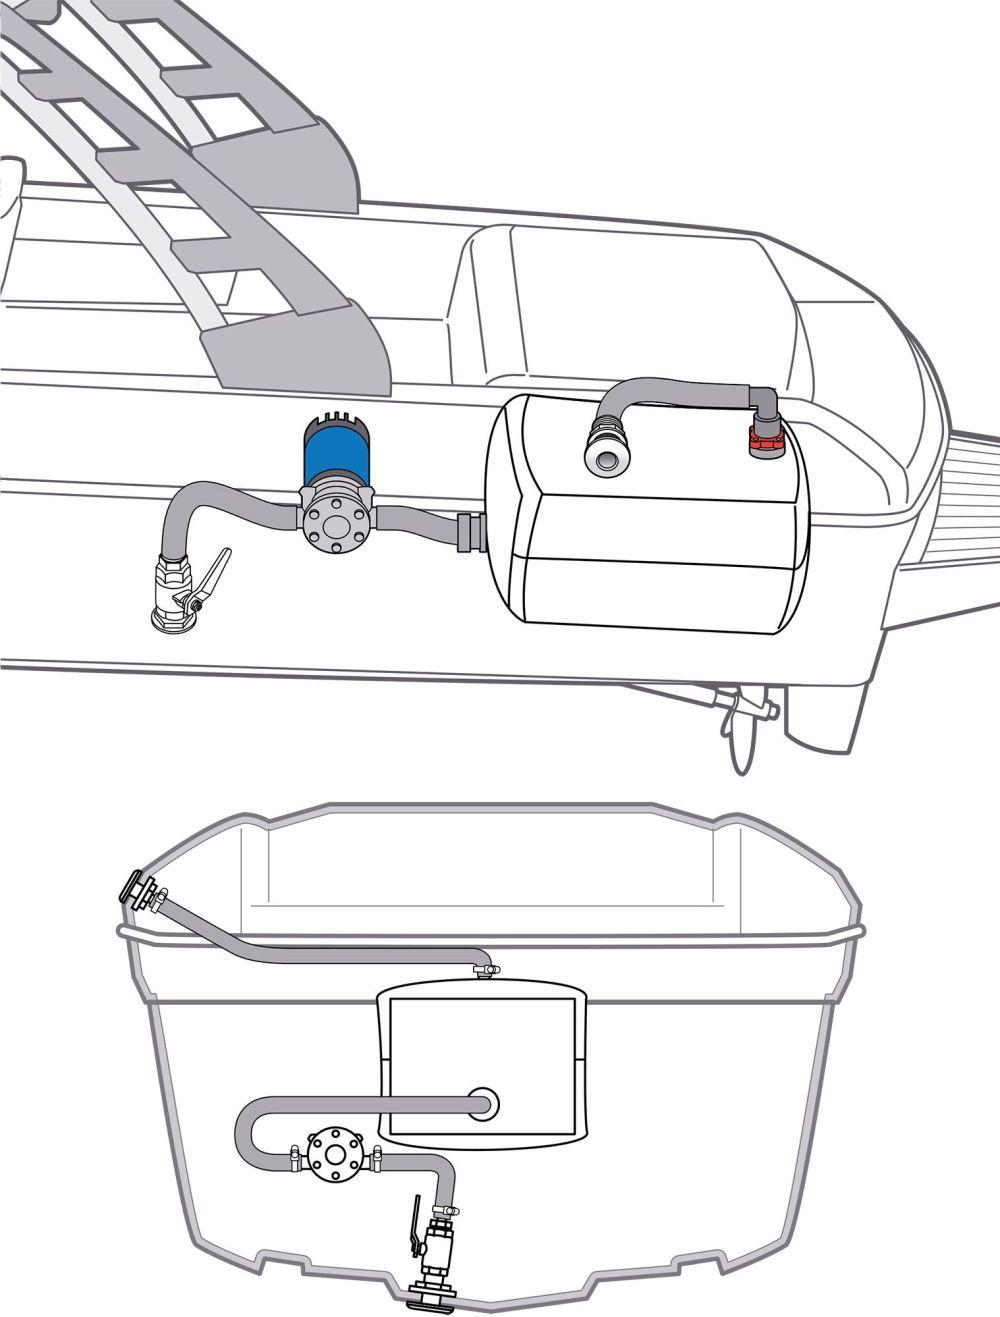 medium resolution of ski supreme boat wiring diagram